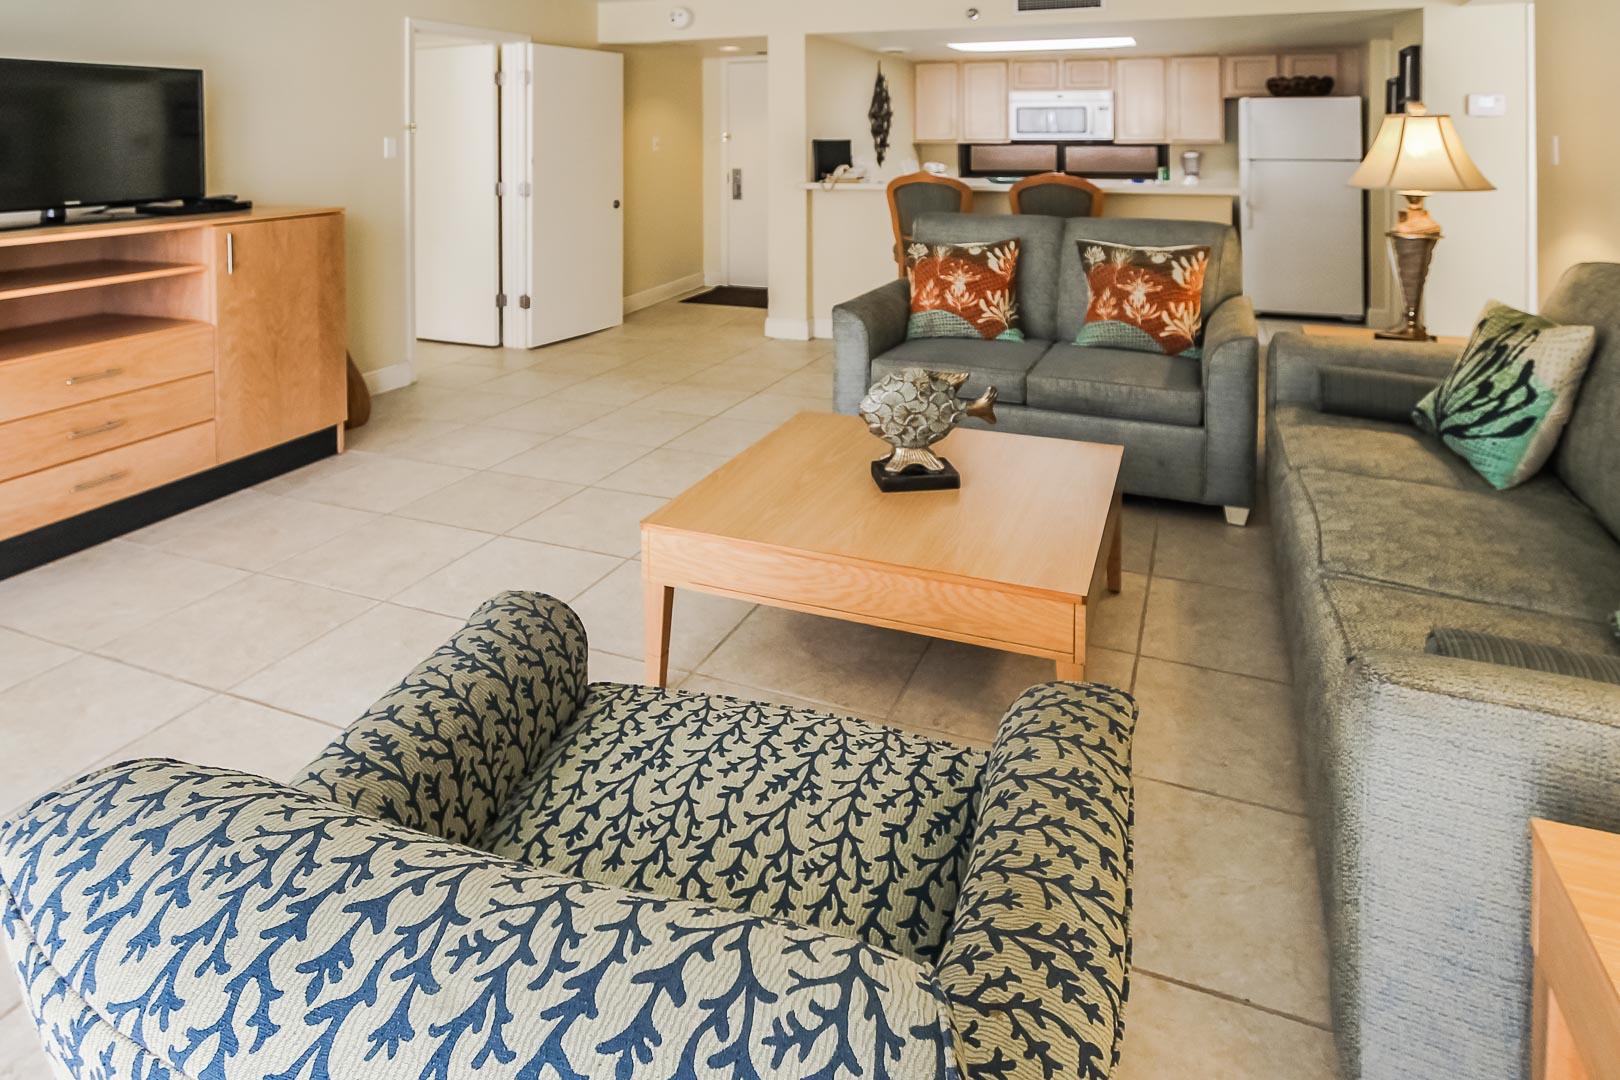 A spacious living room area at VRI's Royale Beach Tennis Club in Texas.